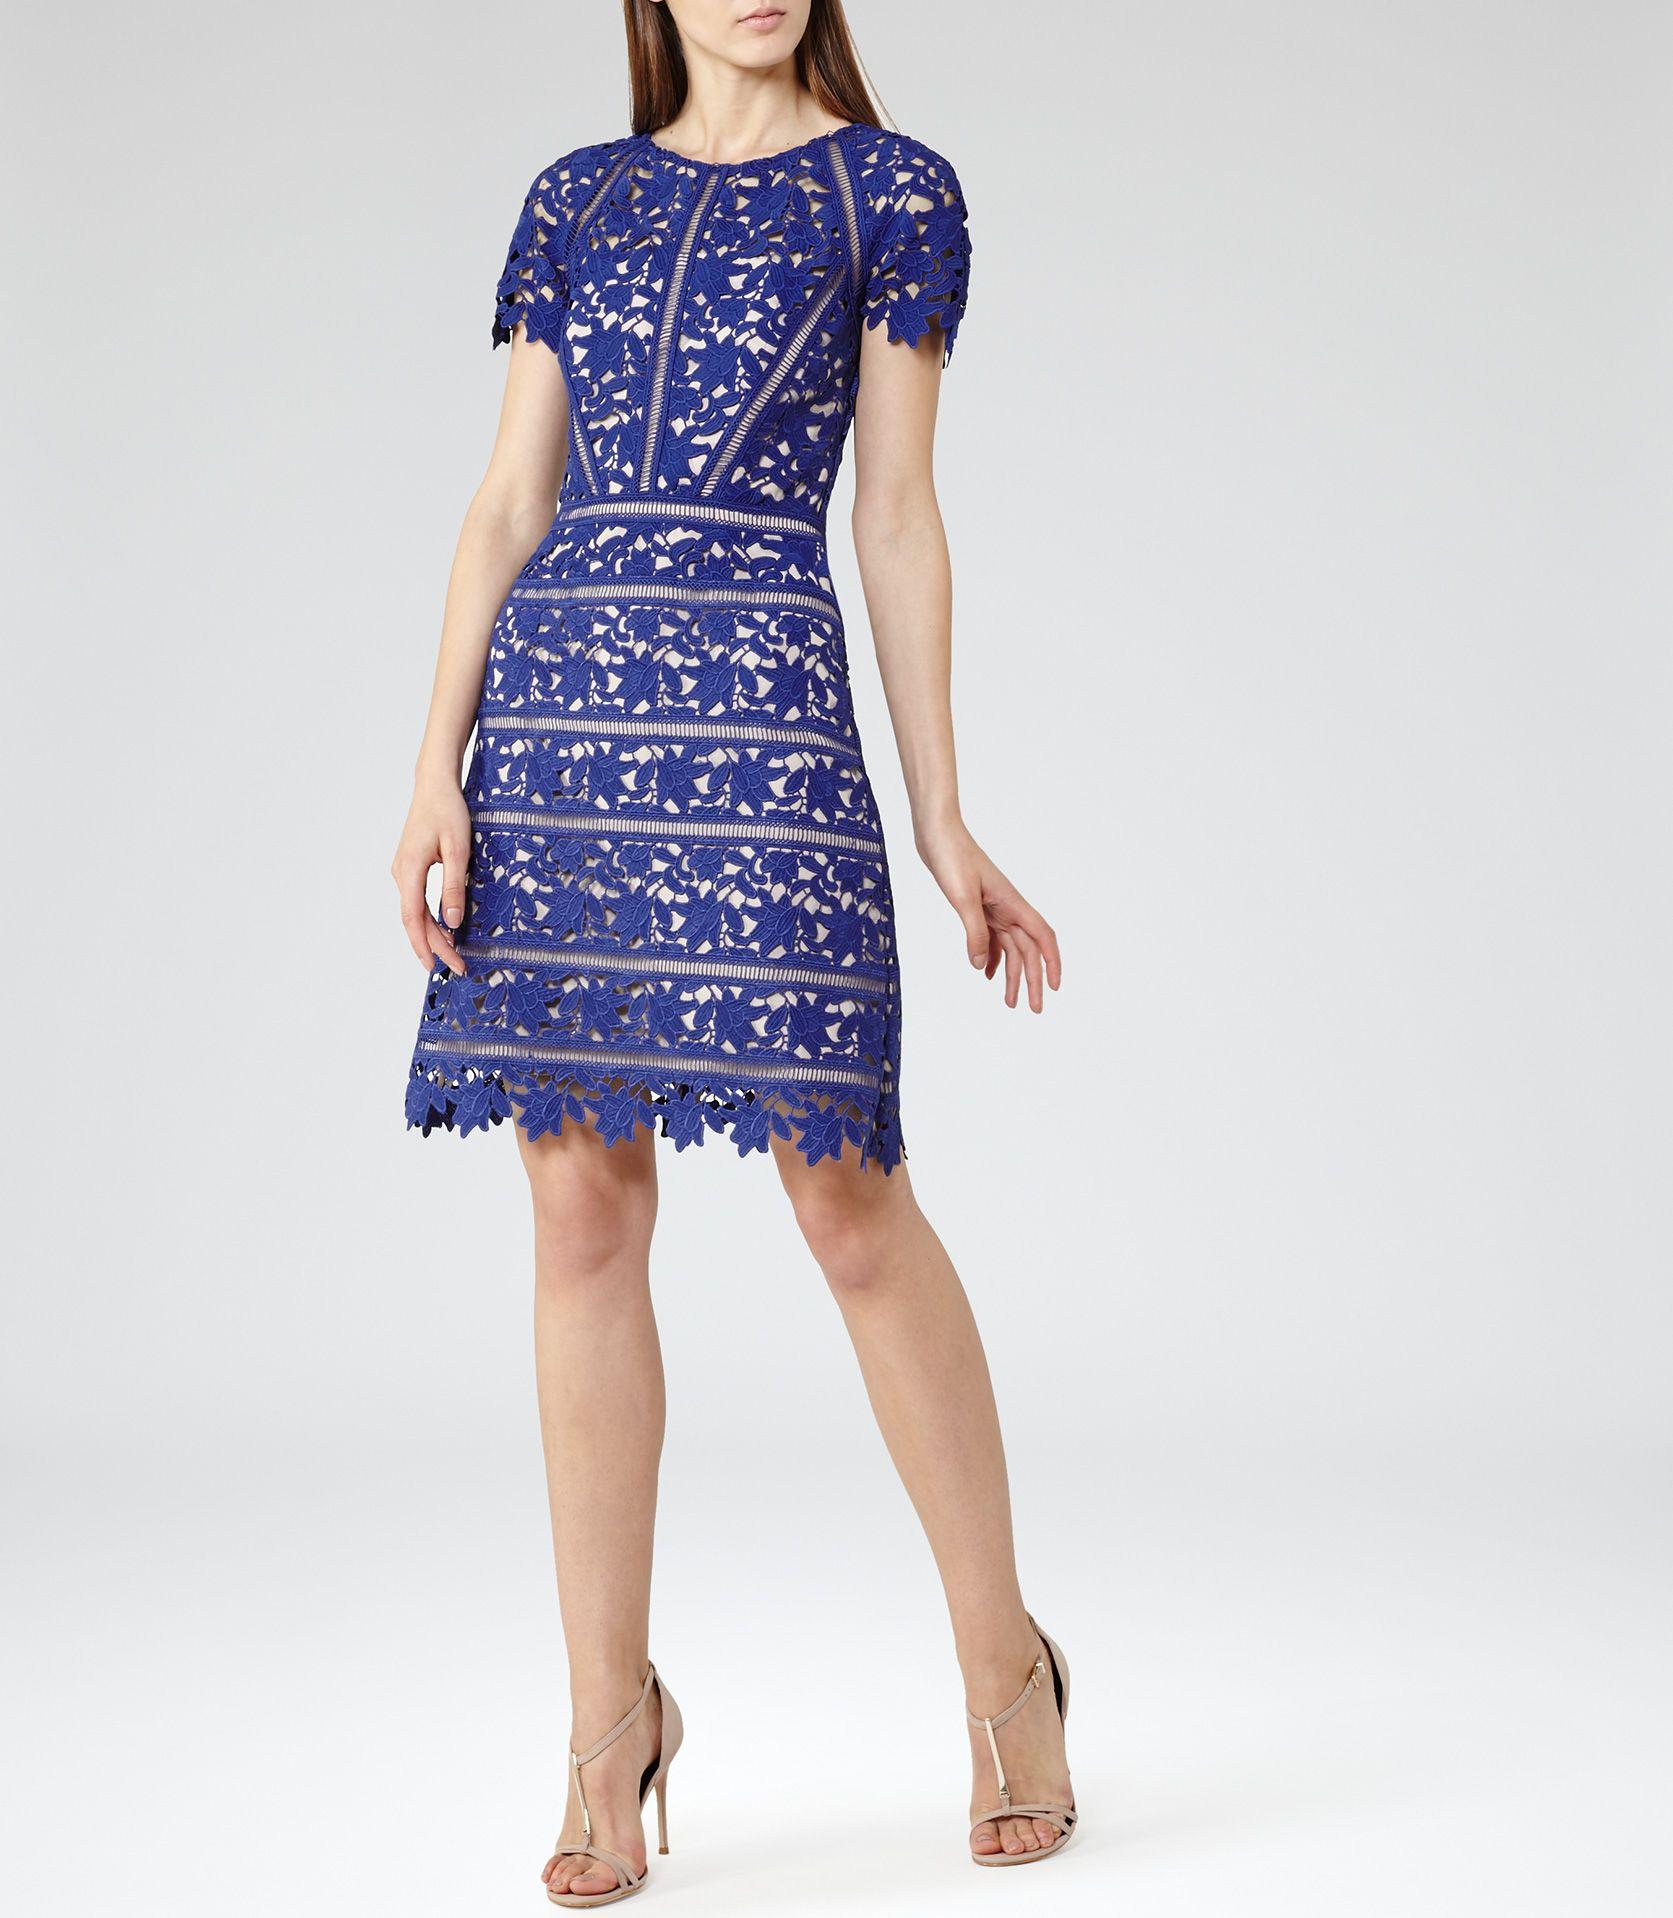 Womens Sapphire Lace Dress - Reiss Orchid | Fashion | Pinterest